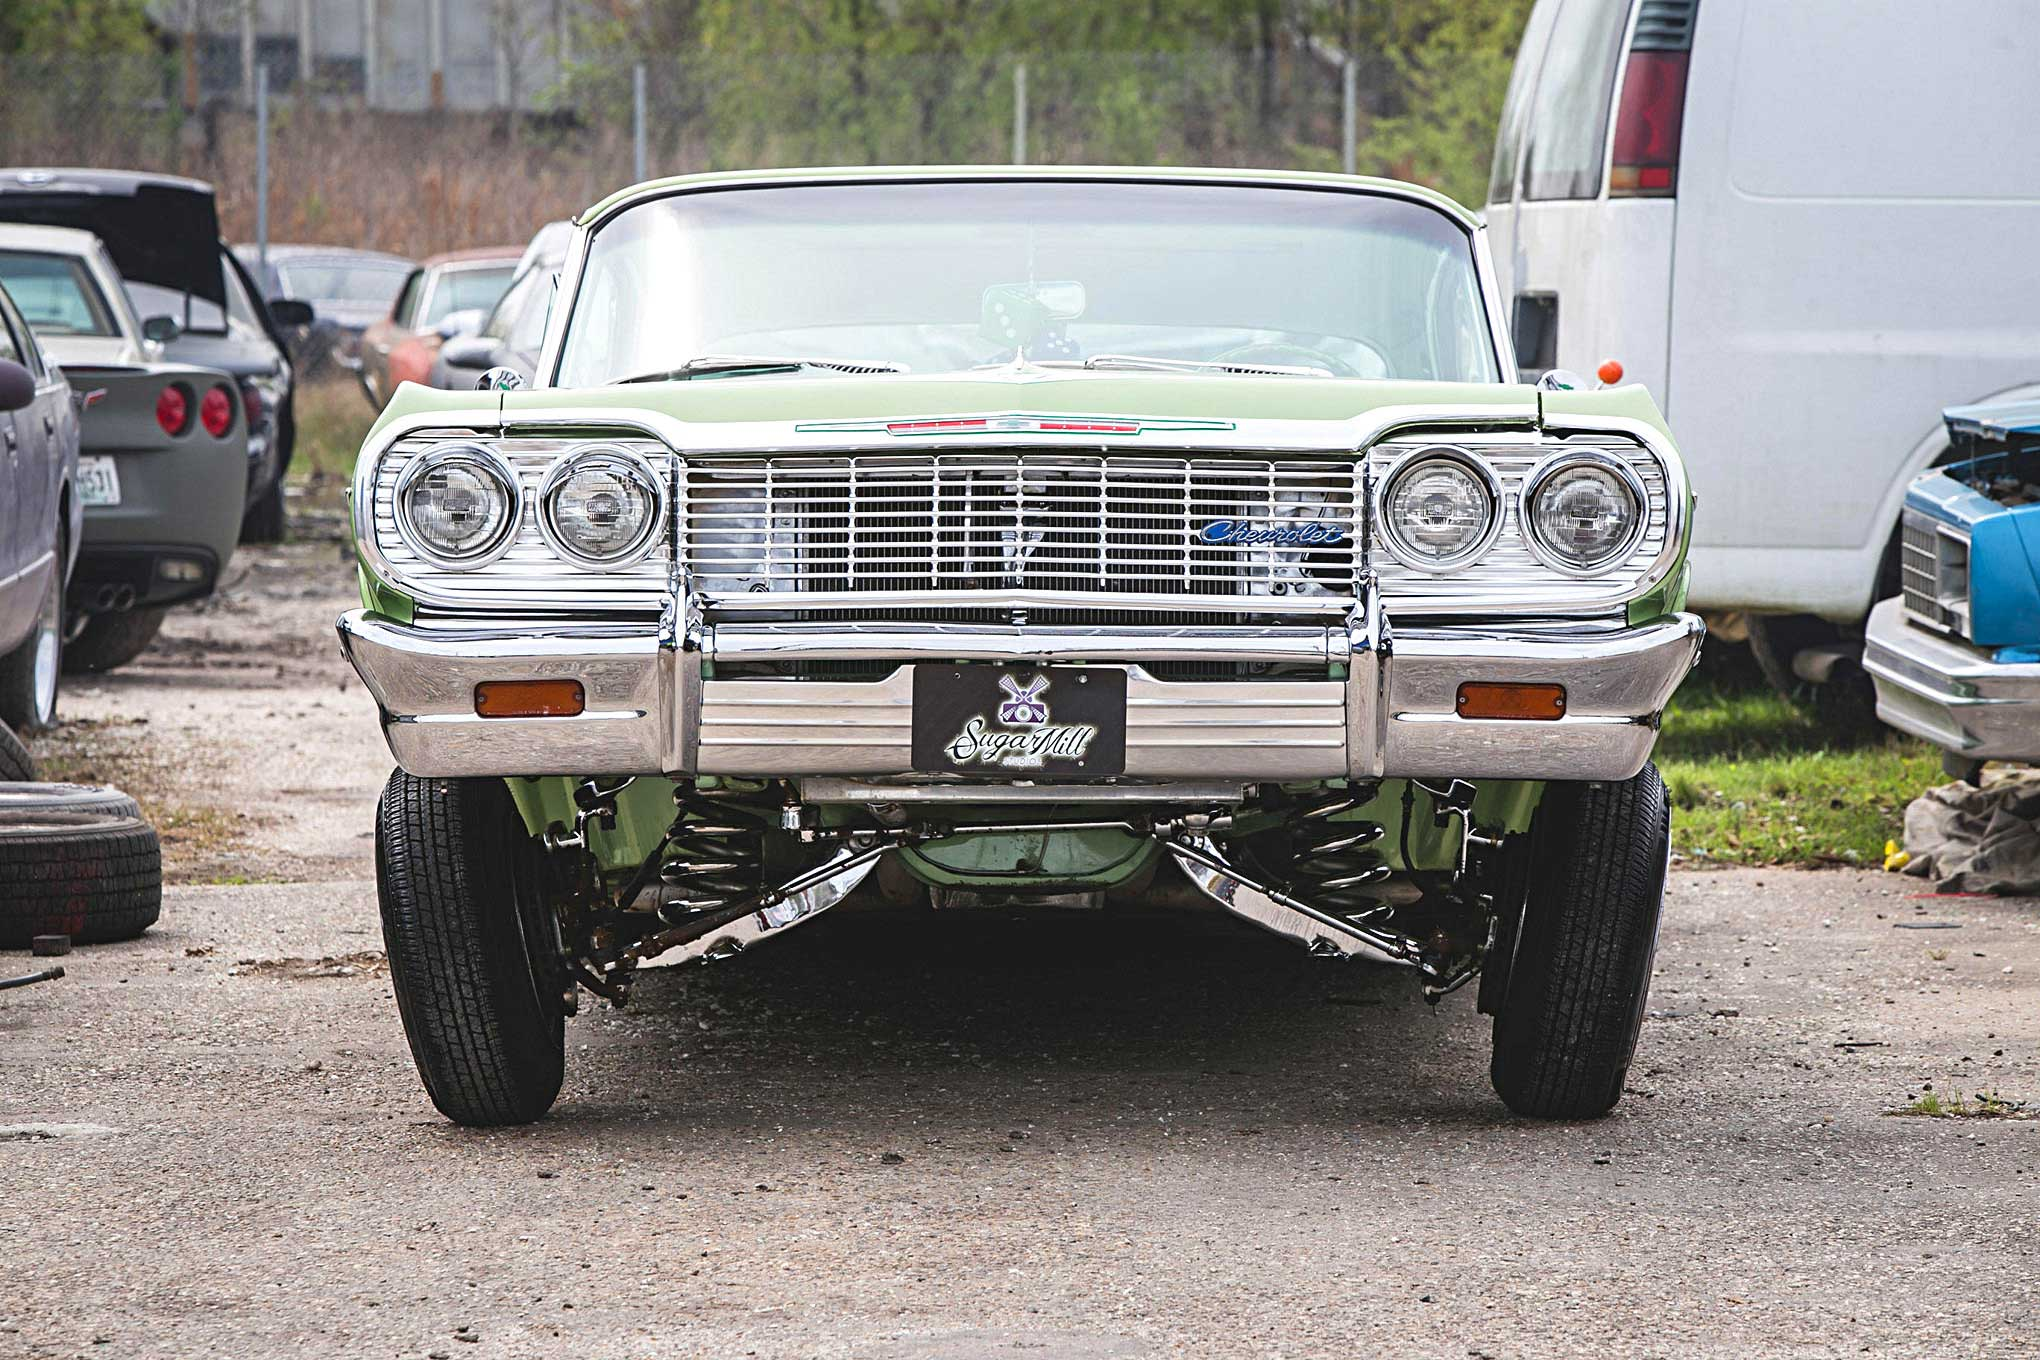 1964 Chevrolet Impala - Spittin' Game